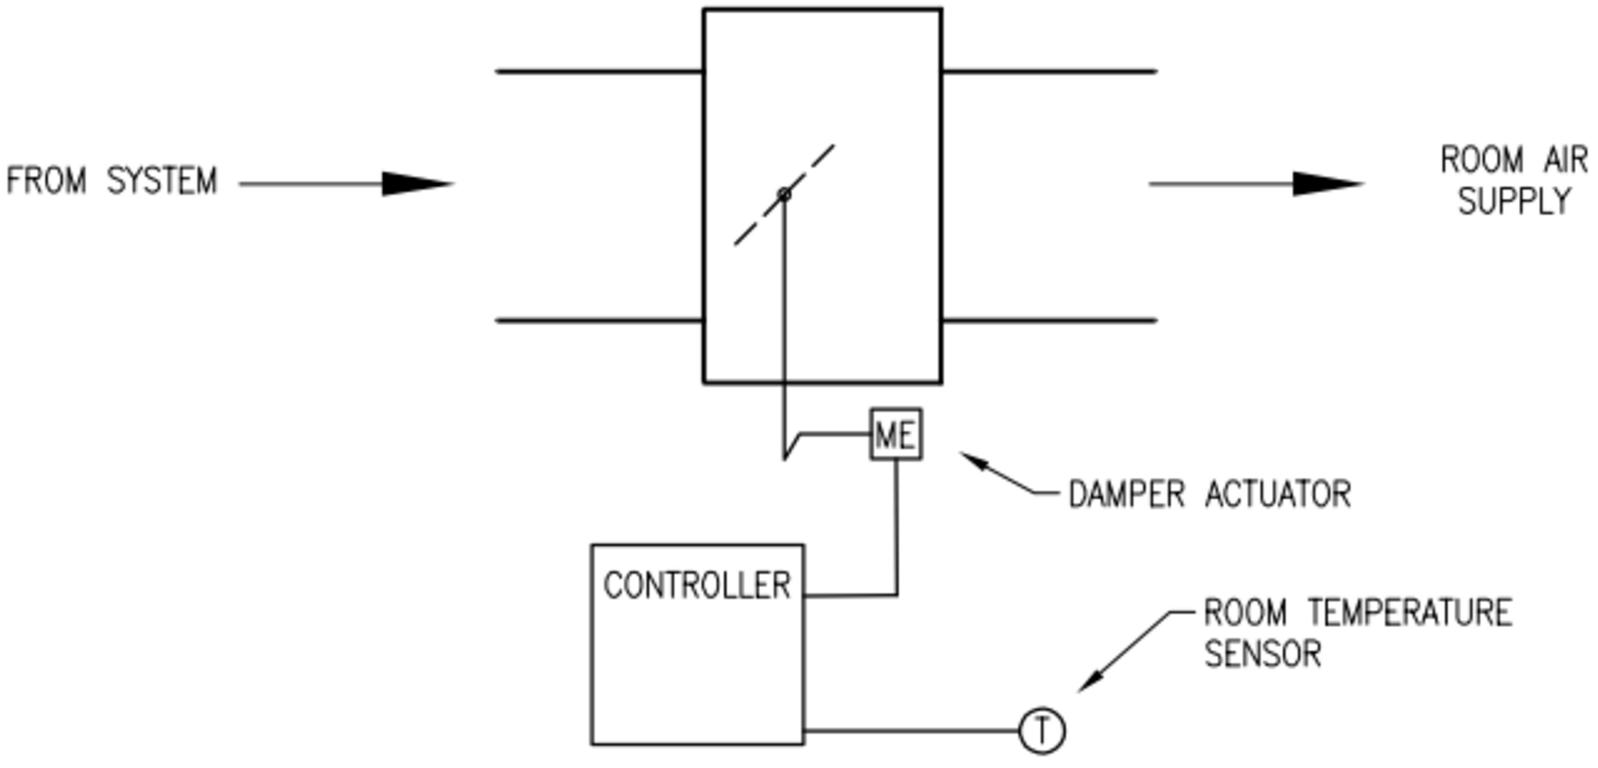 vav airflow diagram illustration of wiring diagram \u2022 rh  davisfamilyreunion us at what is the